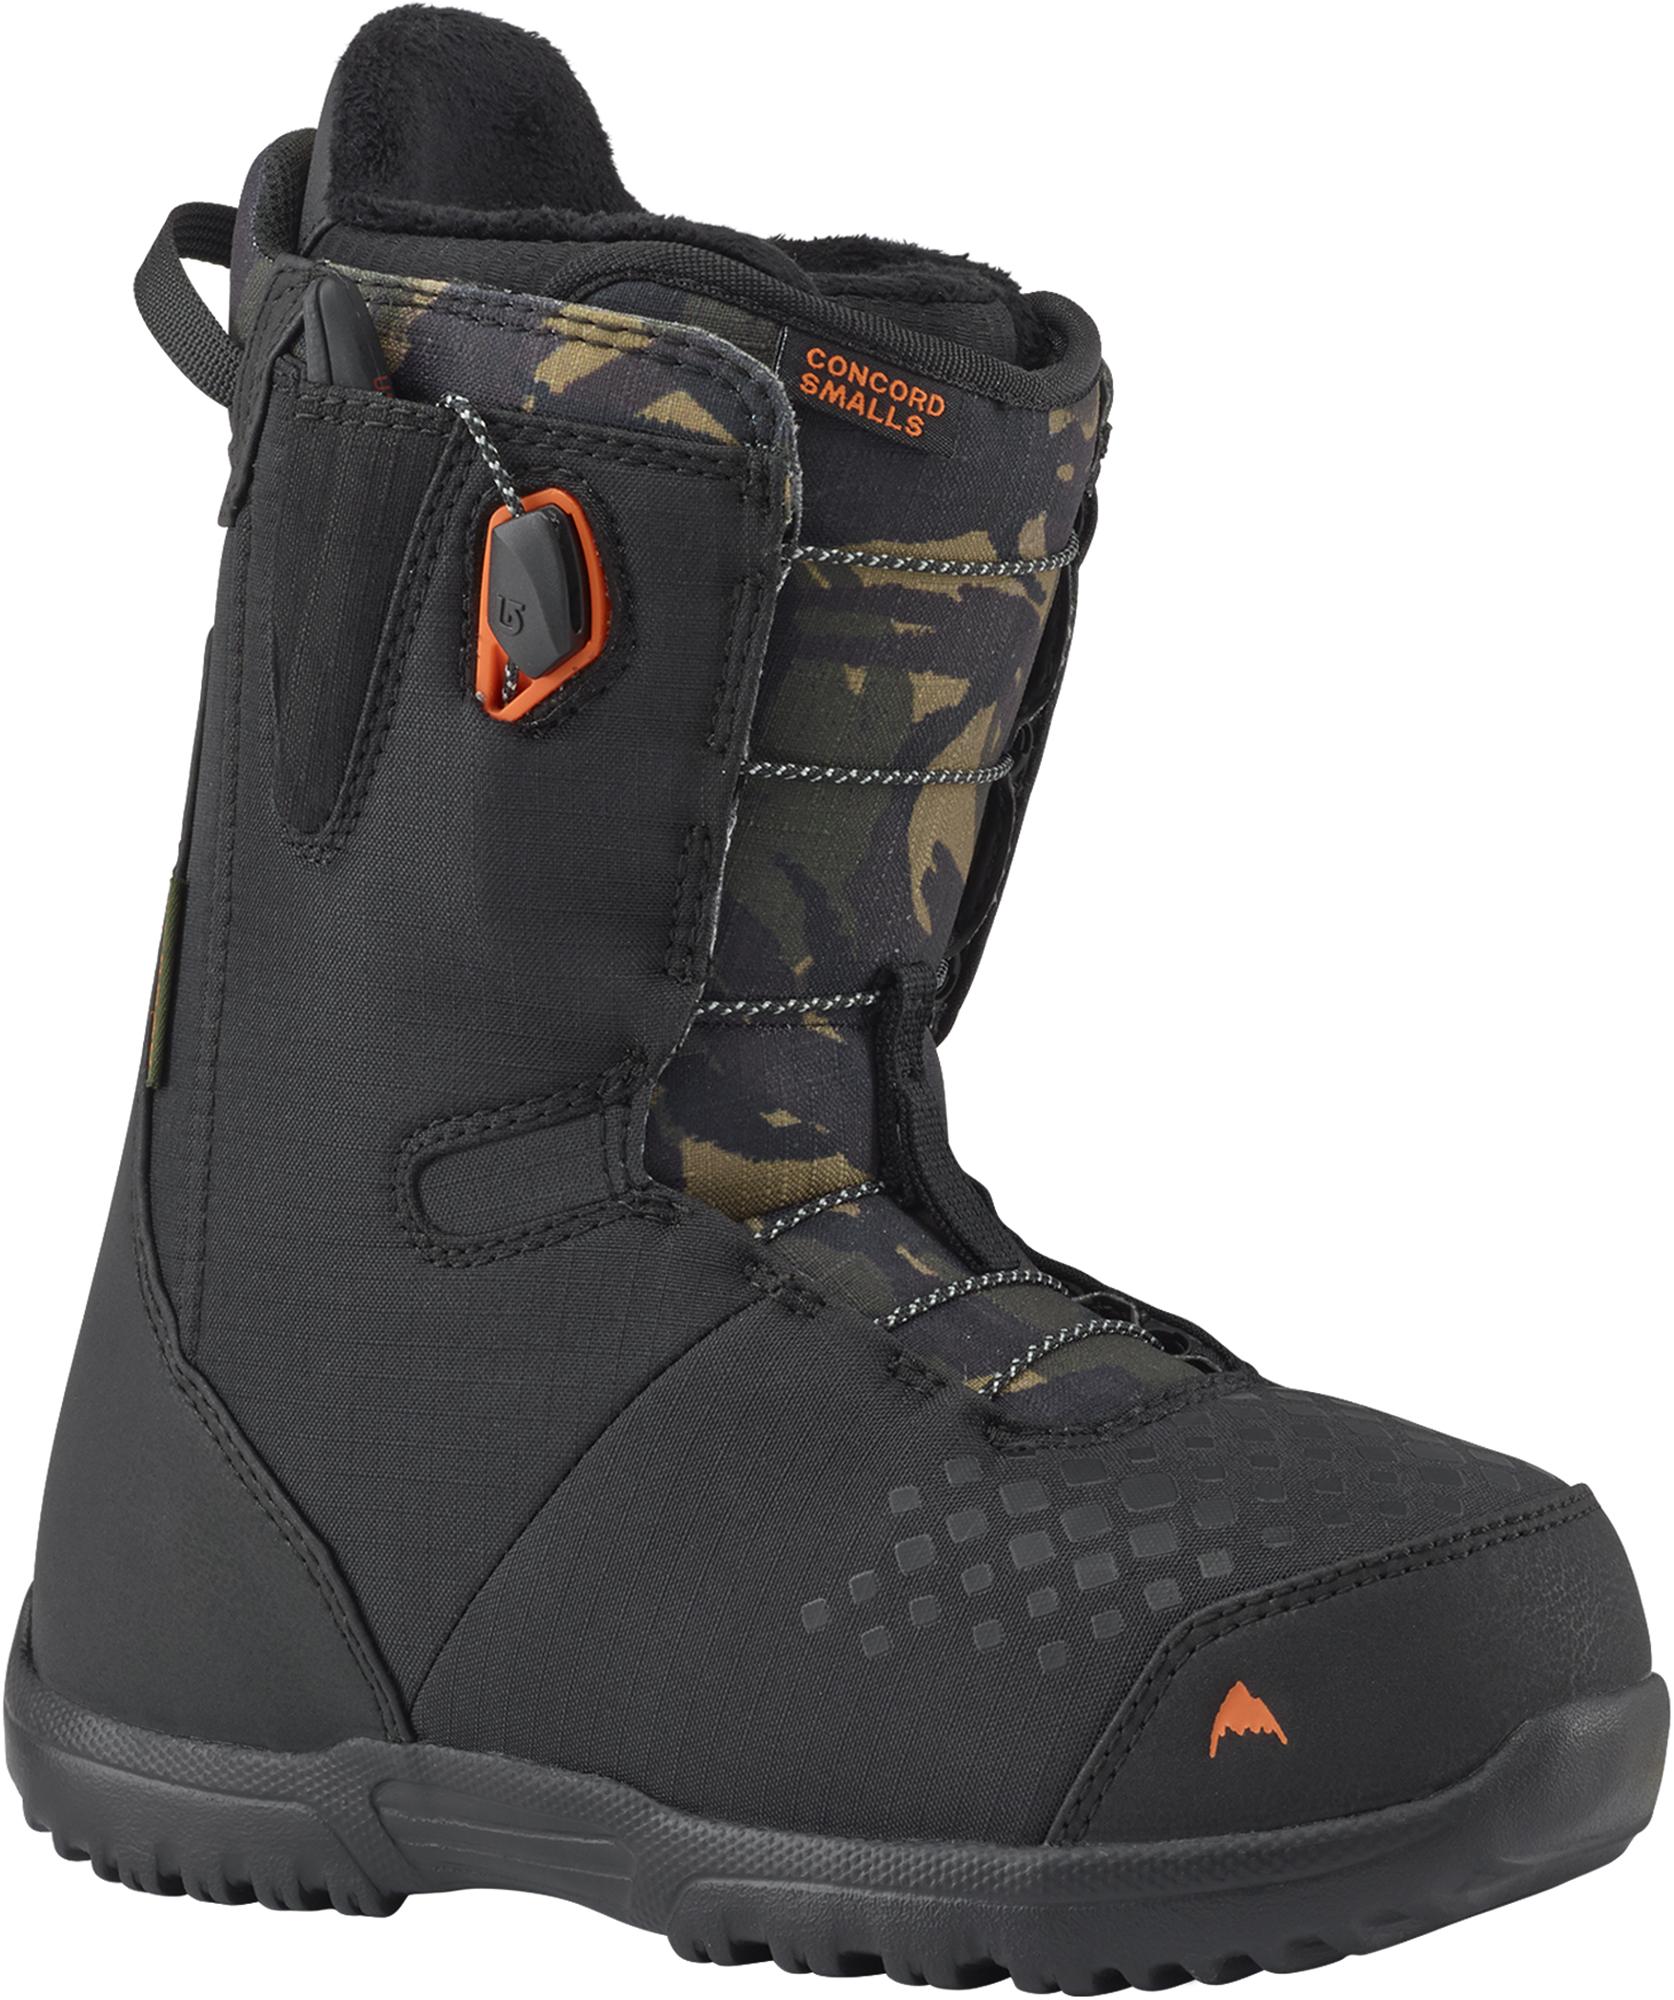 Burton Сноубордические ботинки детские Burton Concord Smalls, размер 34 варежки сноубордические детские dc molan adventure time